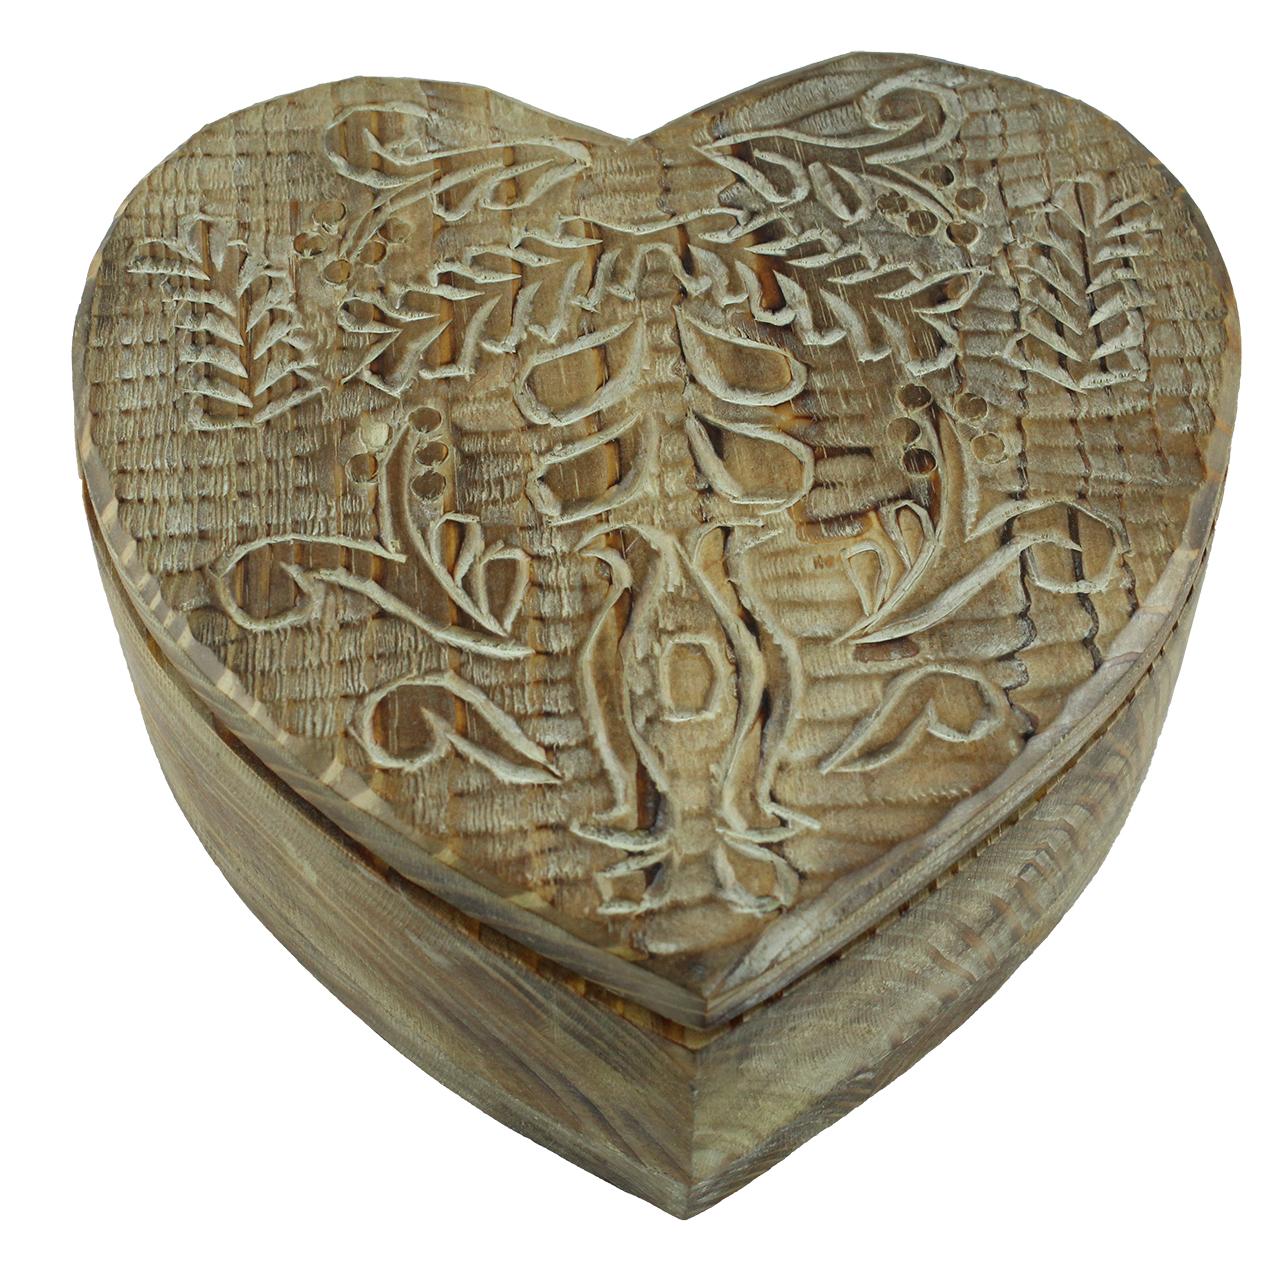 Cutie Decorativa Inima Din Lemn Natur 15x15 Cm